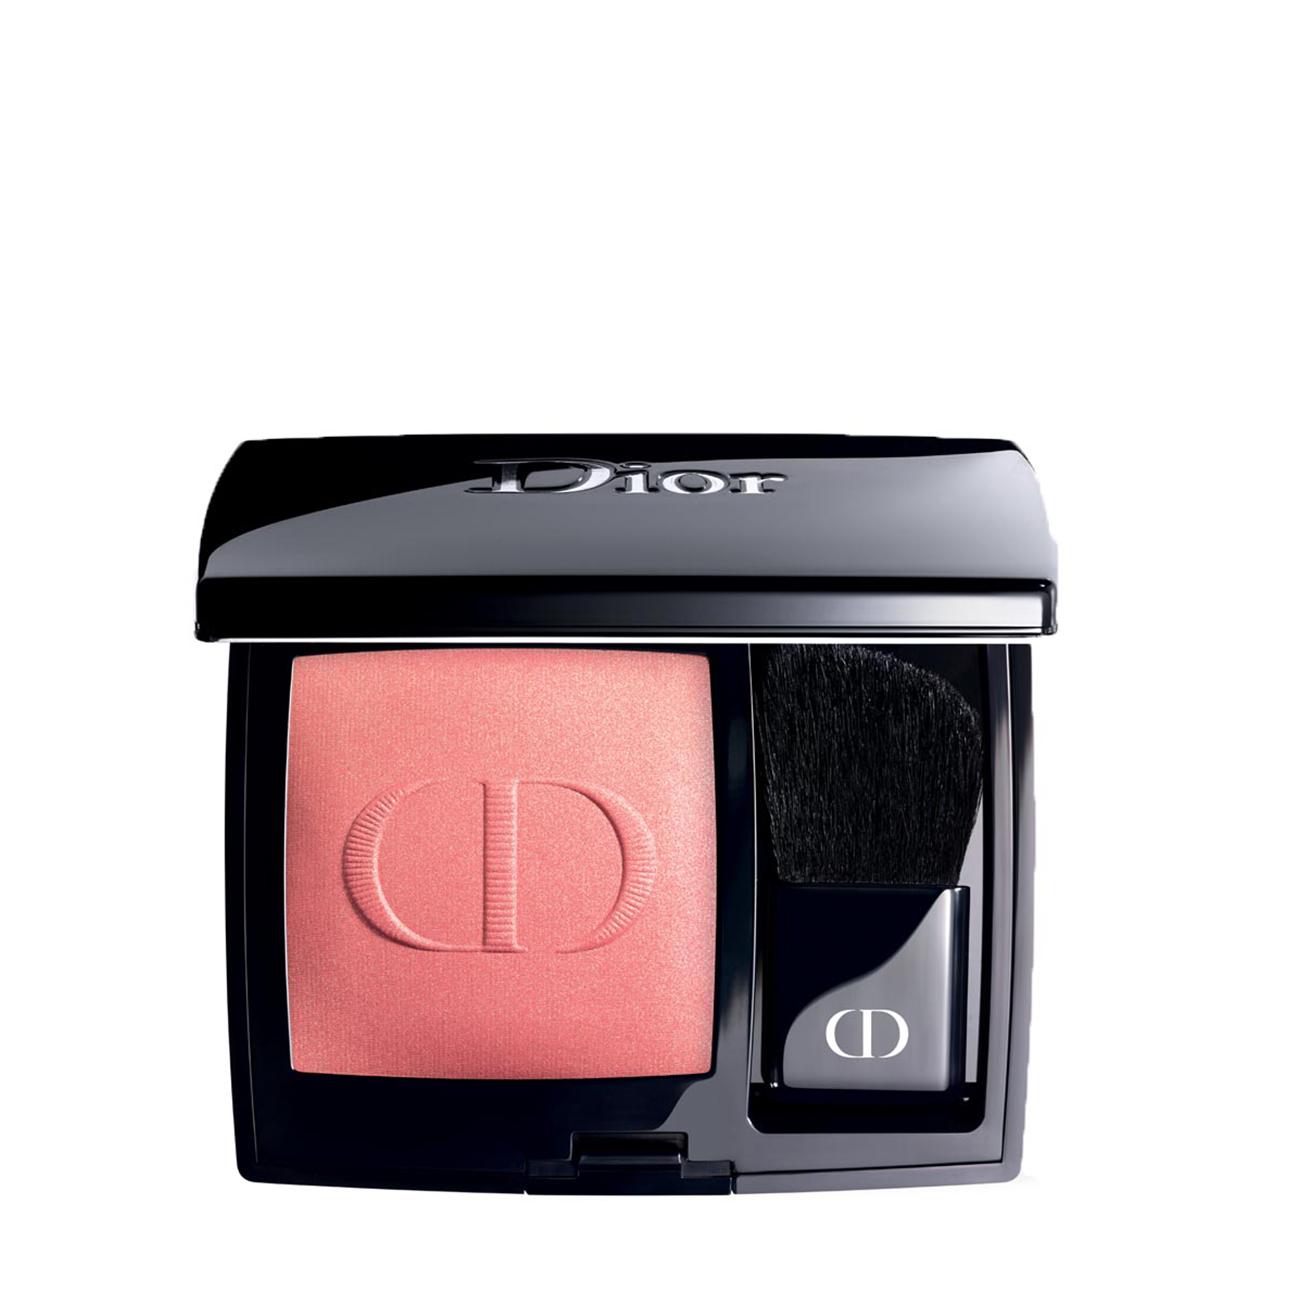 Rouge Blush 6.7gr Rose Montaigne 219 Dior imagine 2021 bestvalue.eu